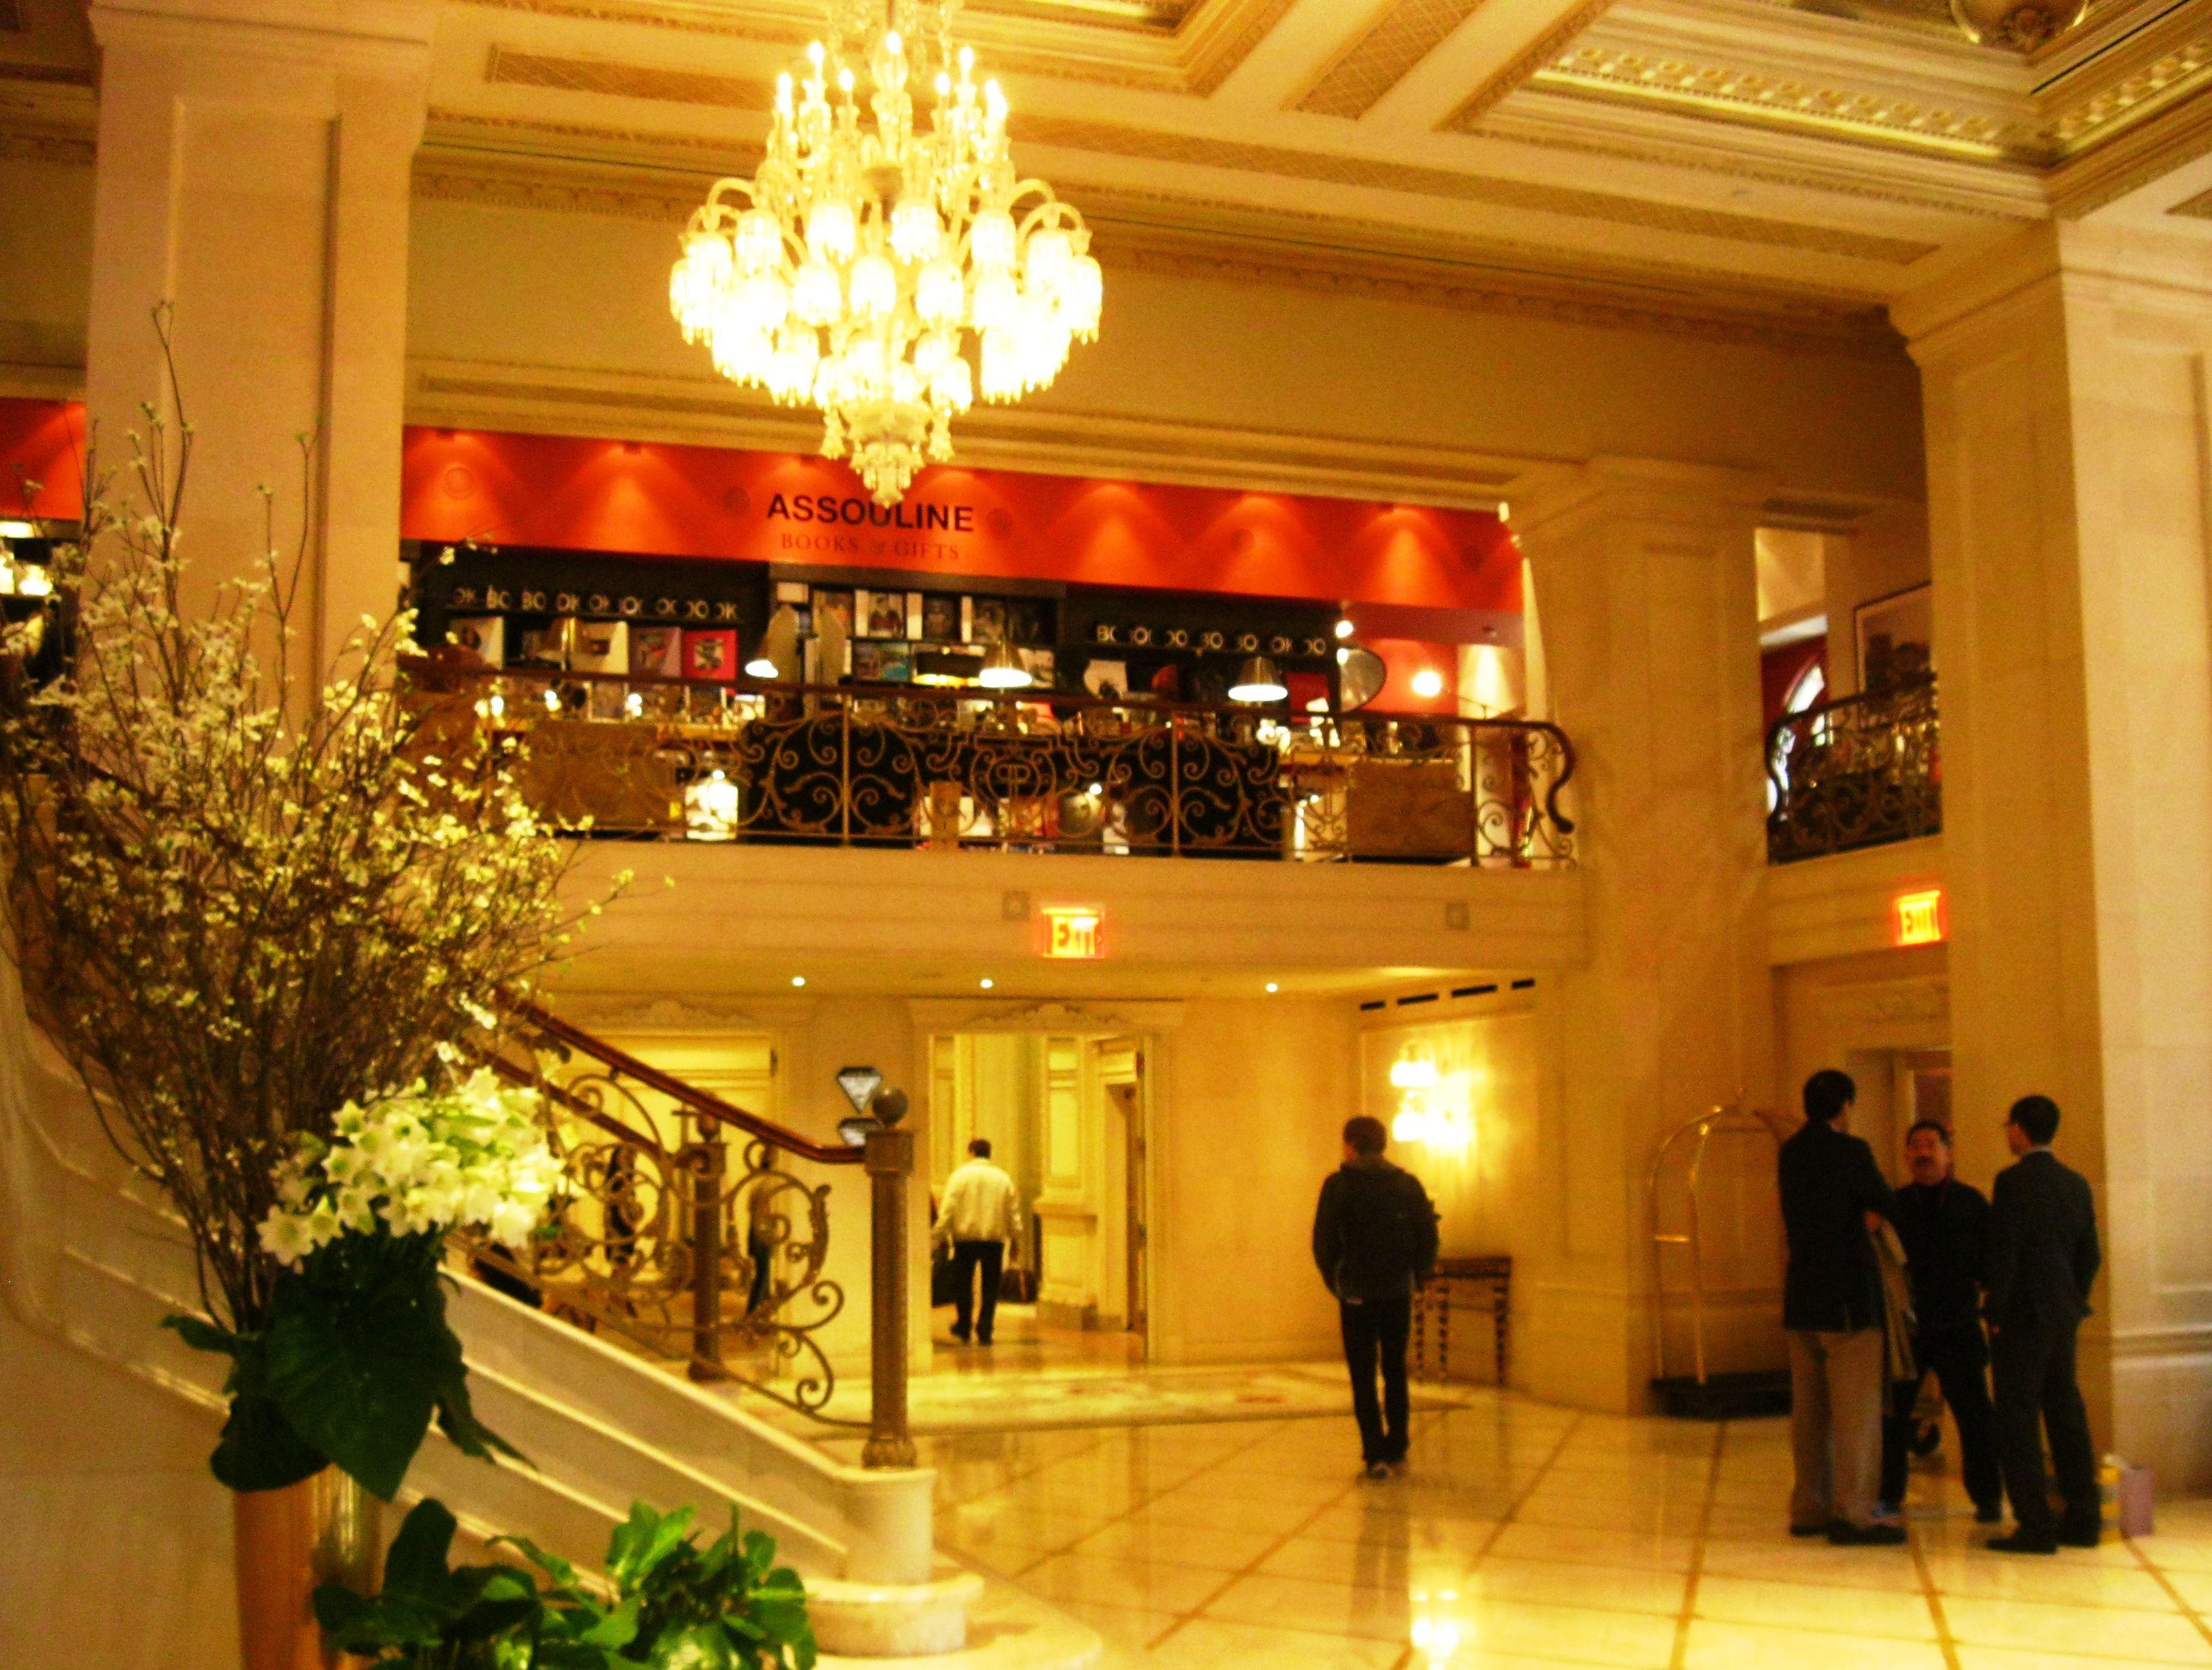 Assouline Lobby Plaza Jpg 3335 2518 Plaza Hotel Hotel Assouline